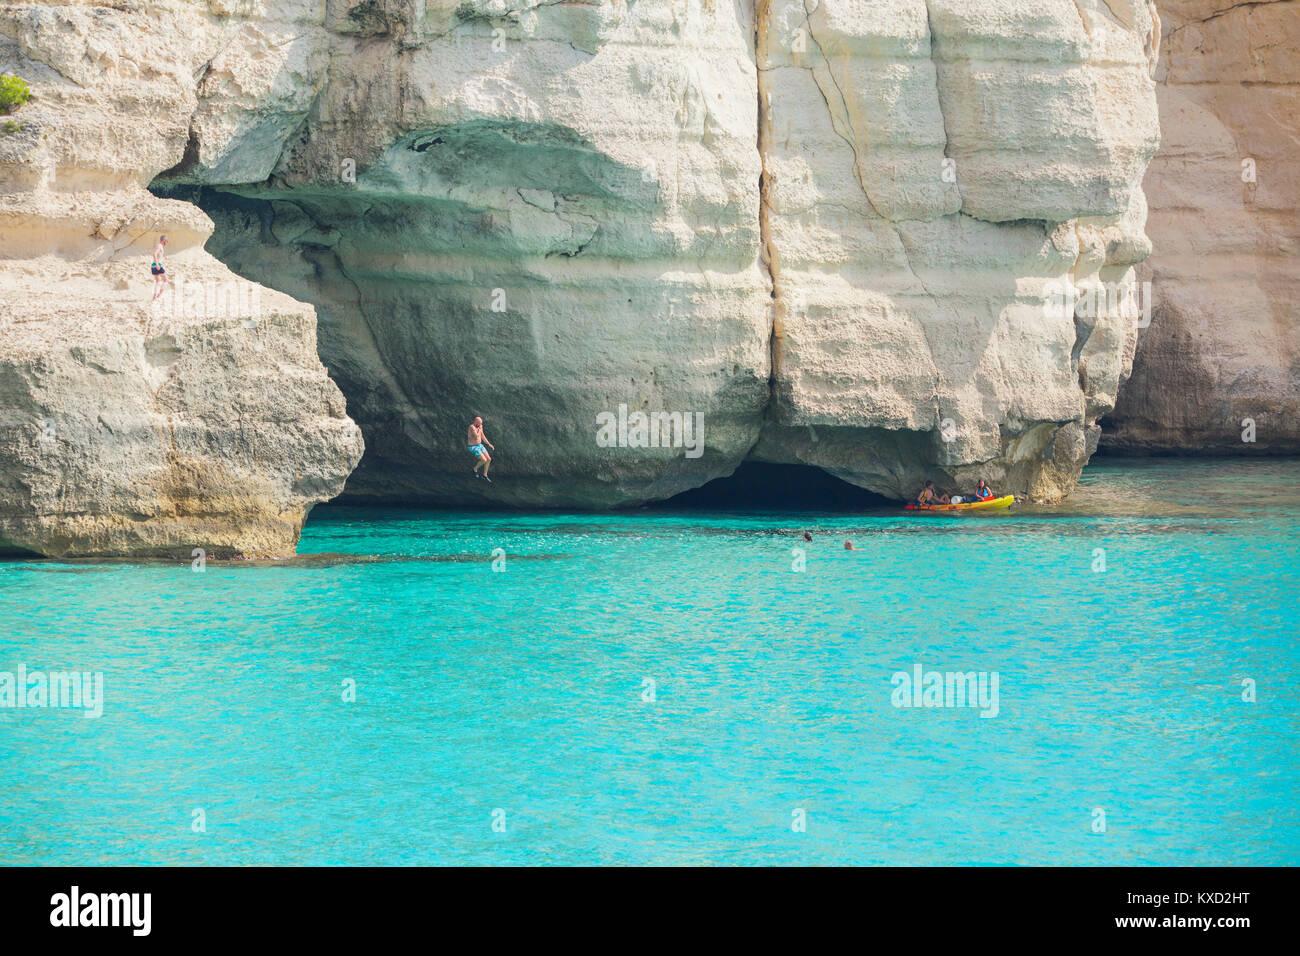 People canoeing and jumping into the water near Cala Mitjana, Menorca, Balearic Islands, Spain Stock Photo